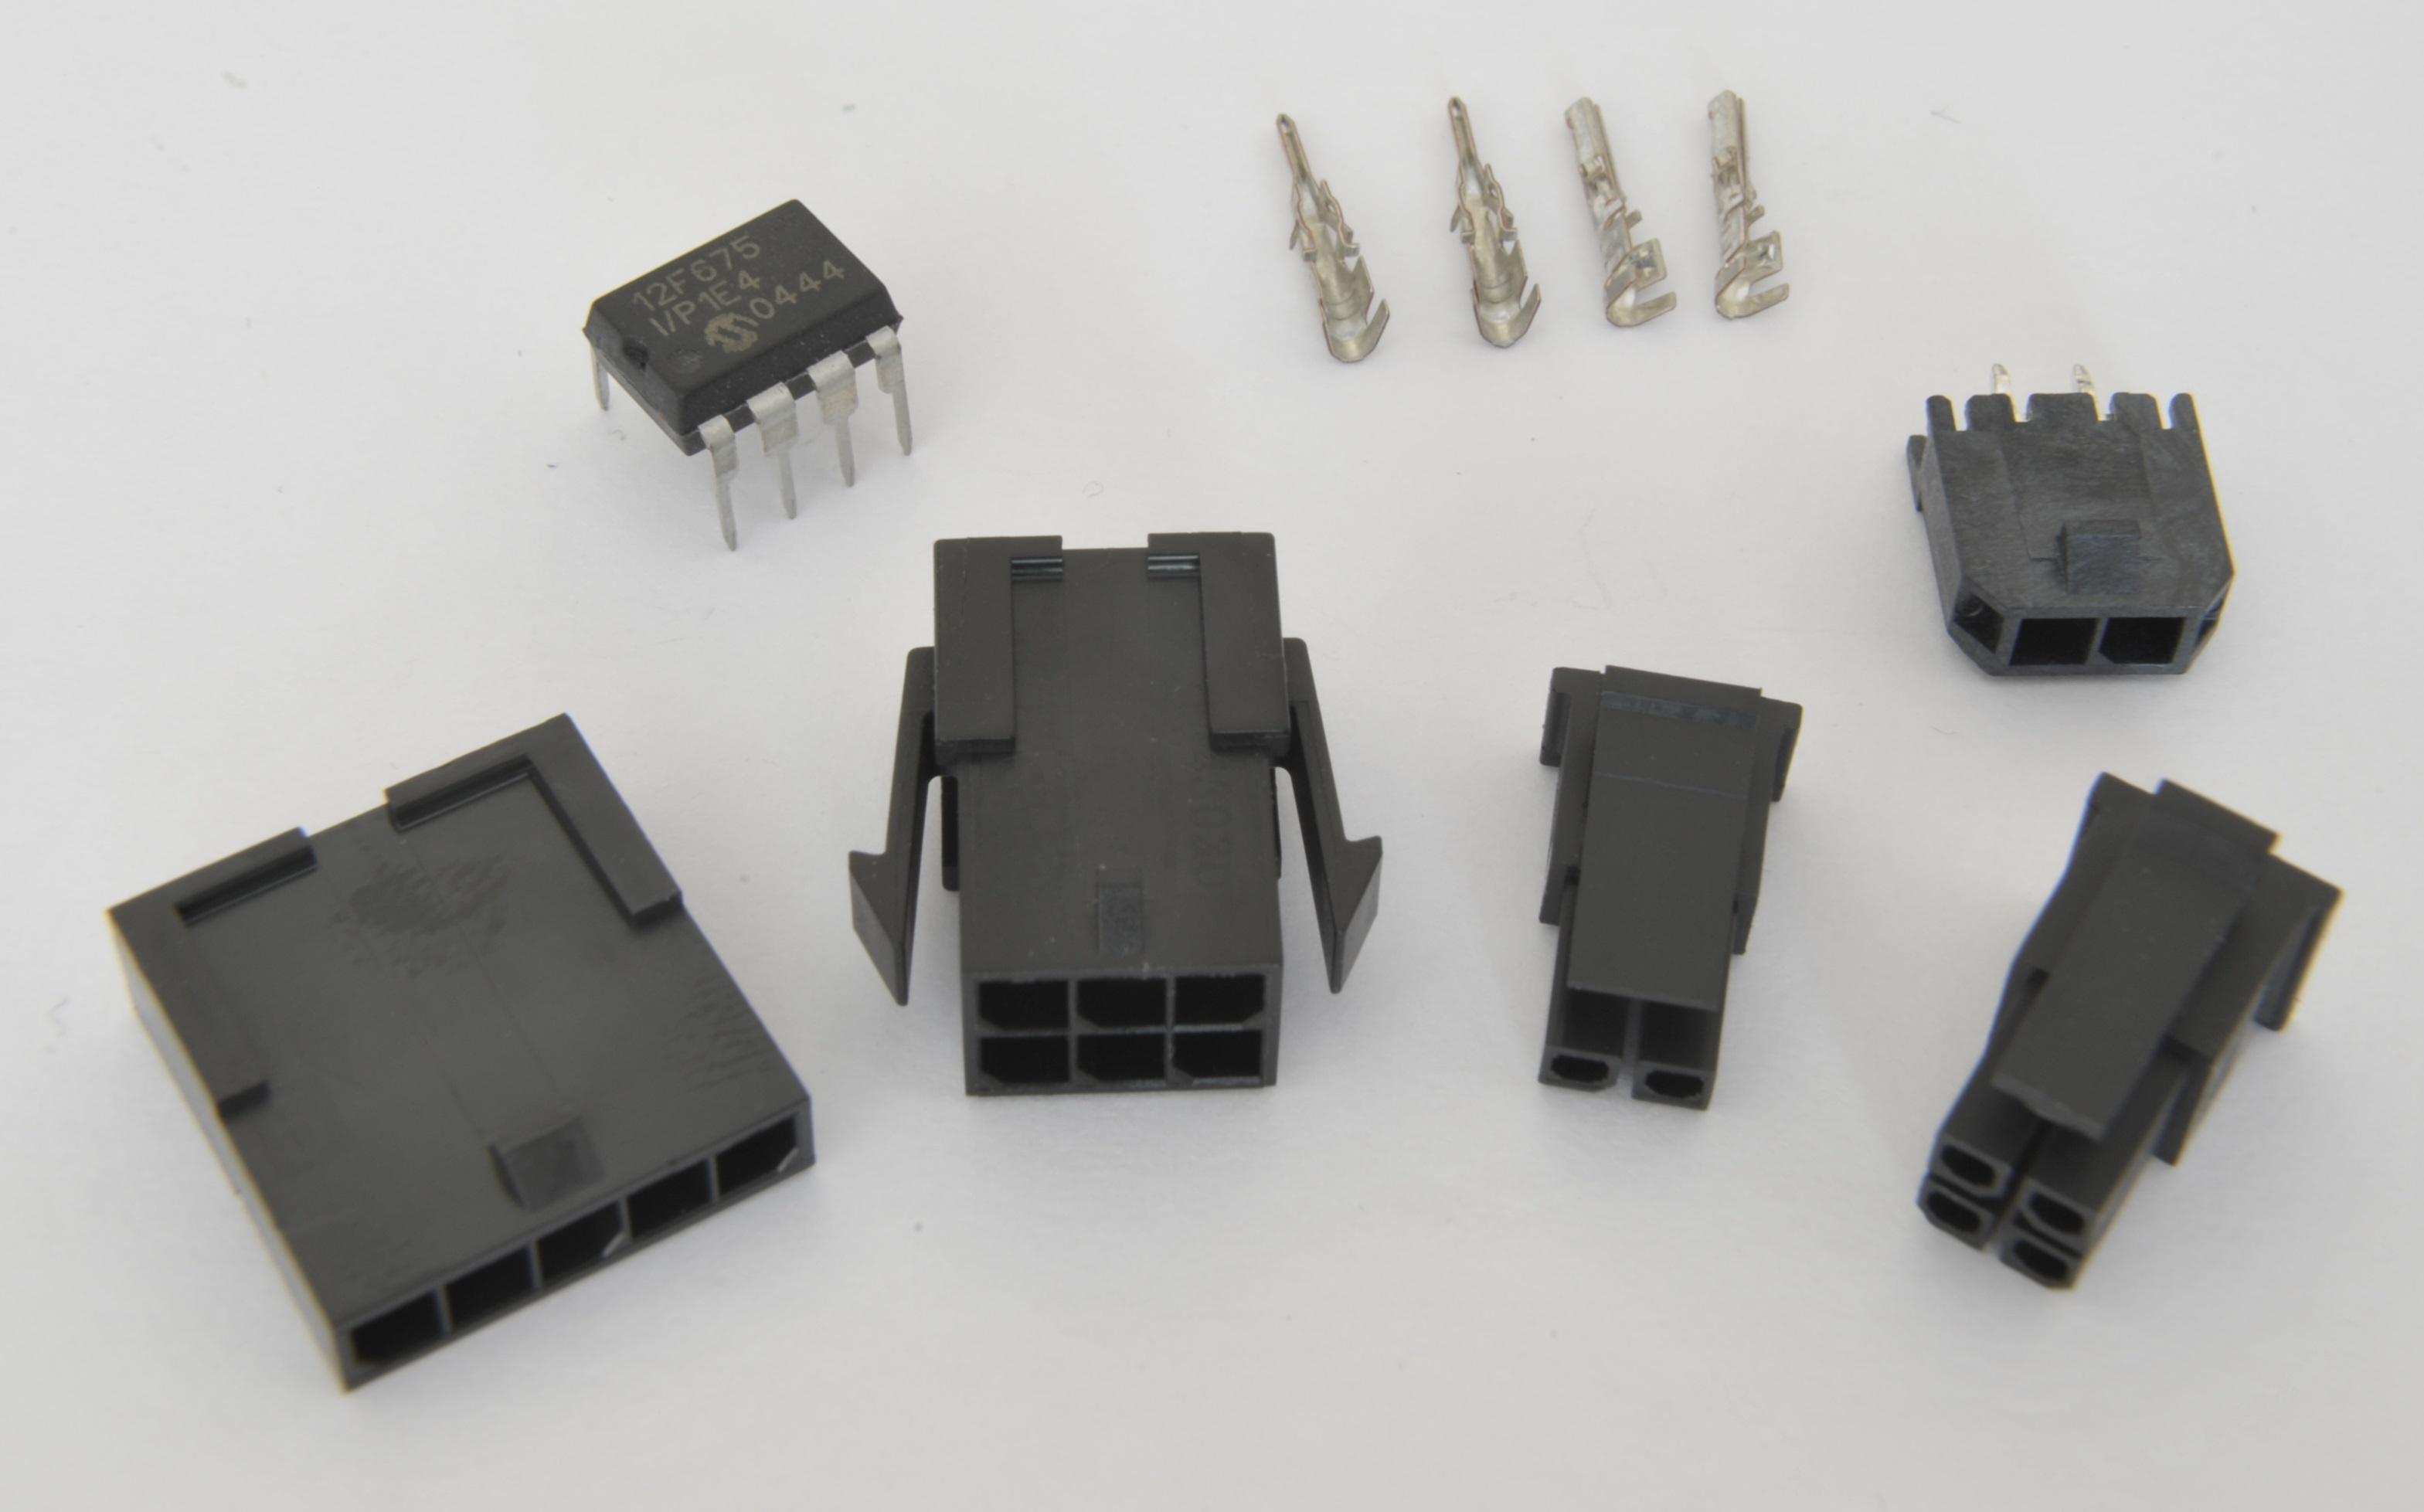 Common wire-to-board, wire-to-wire connectors, and crimp ...